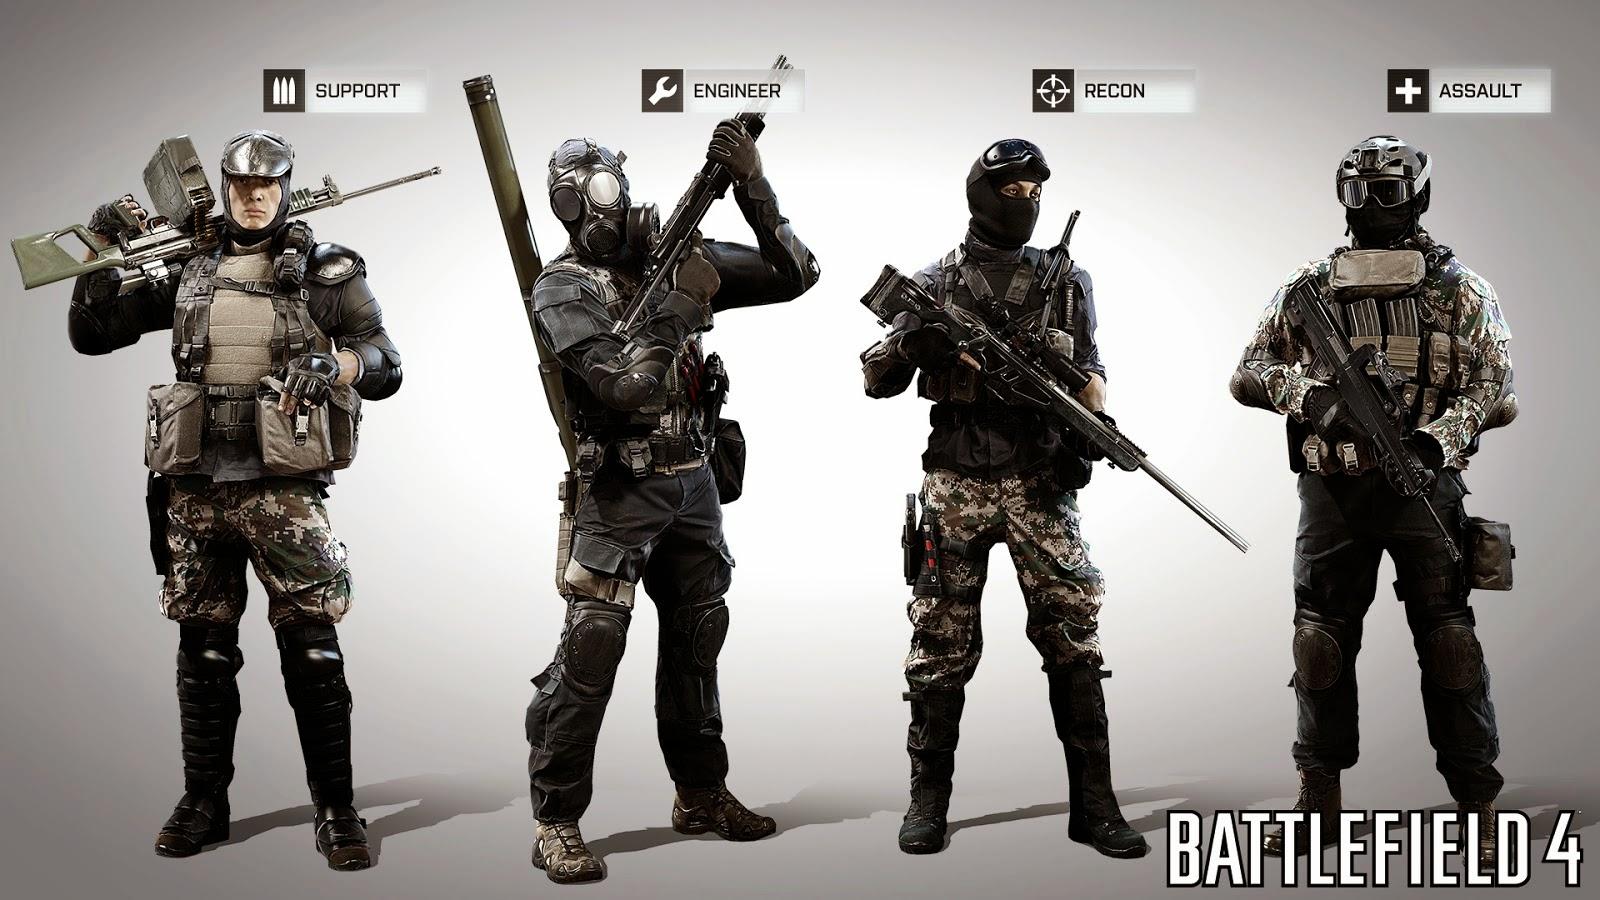 Serubi: download battlefield 4 pc game full version direct link.